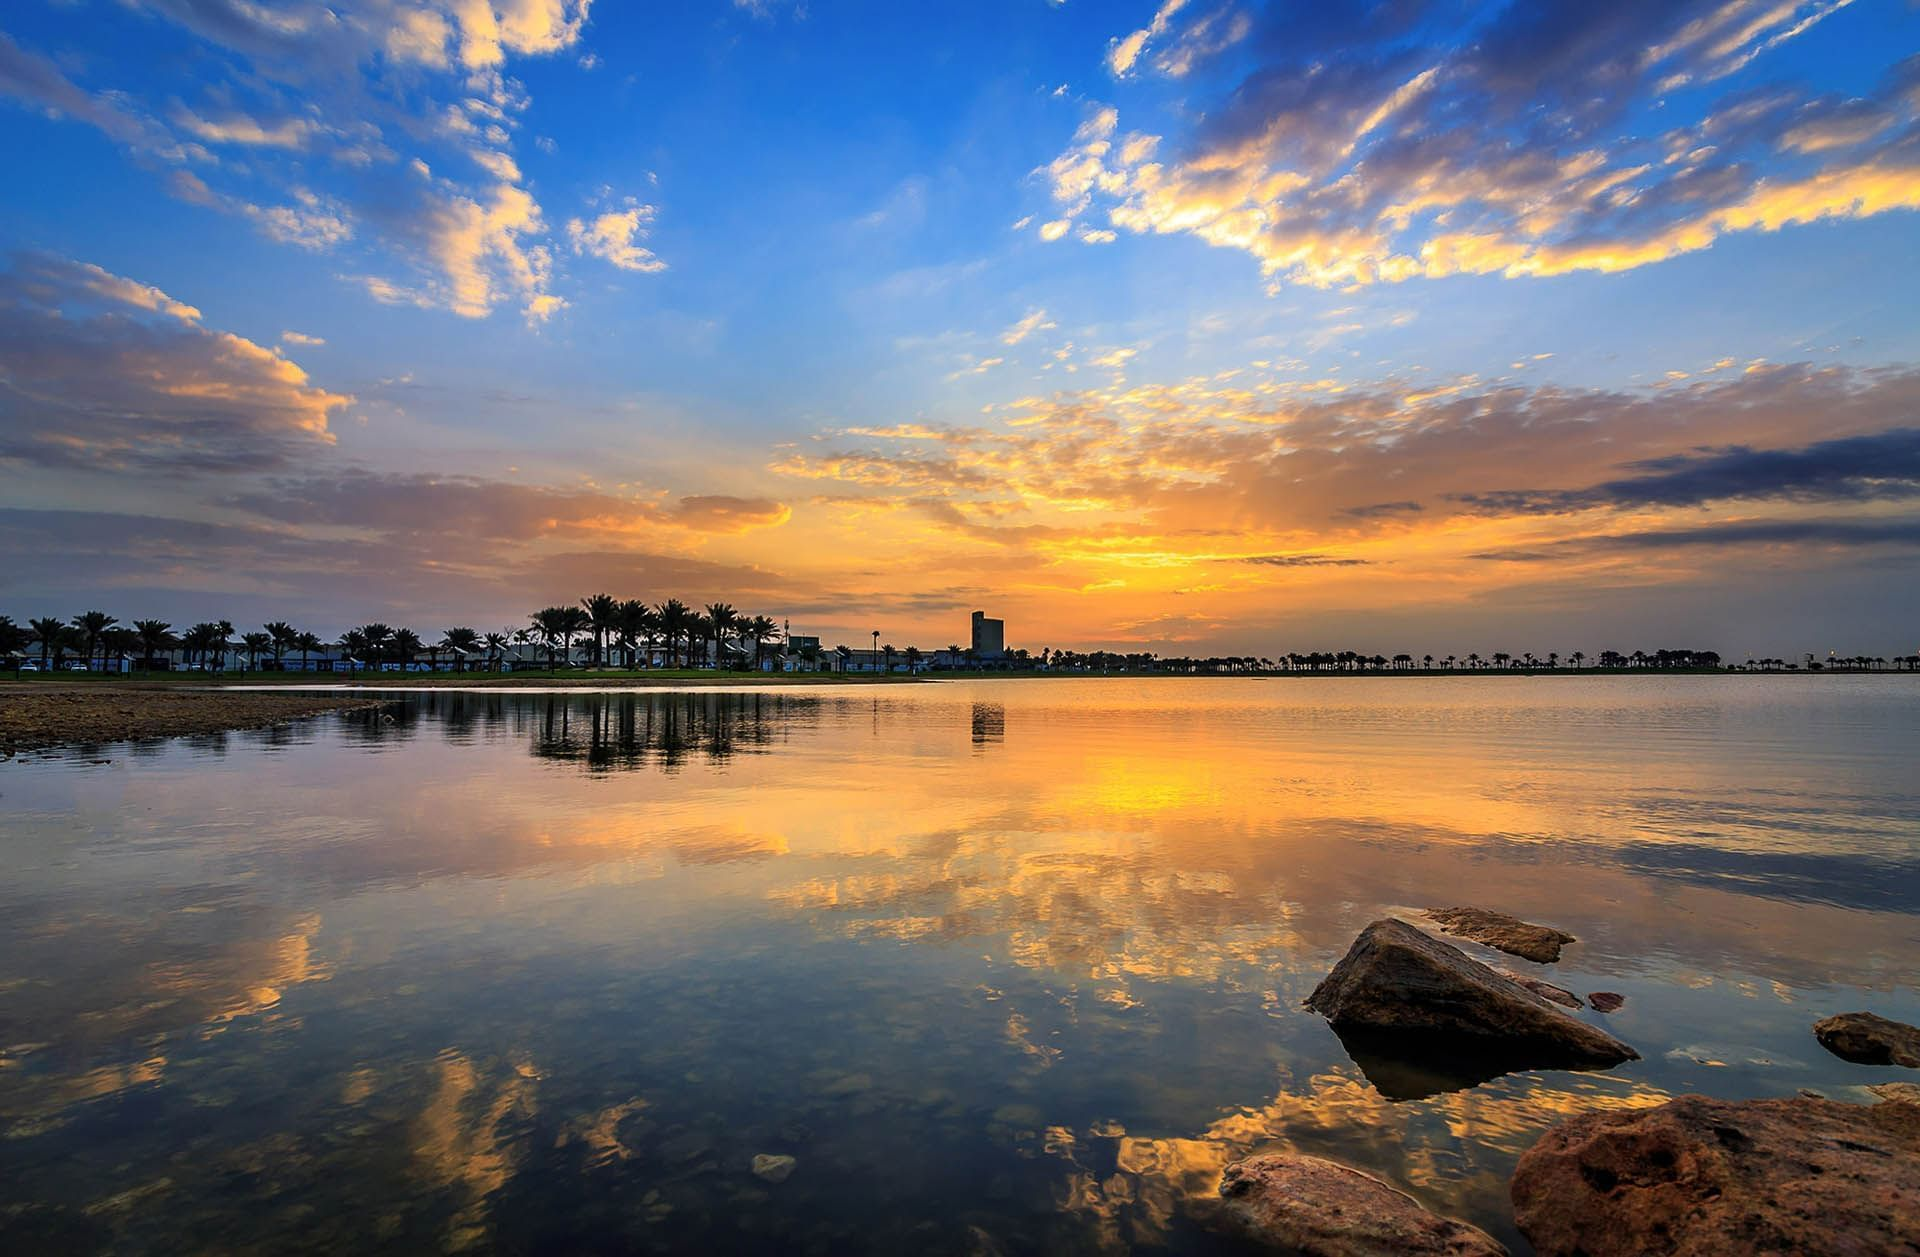 Sunrise view Modon Lake in Dammam